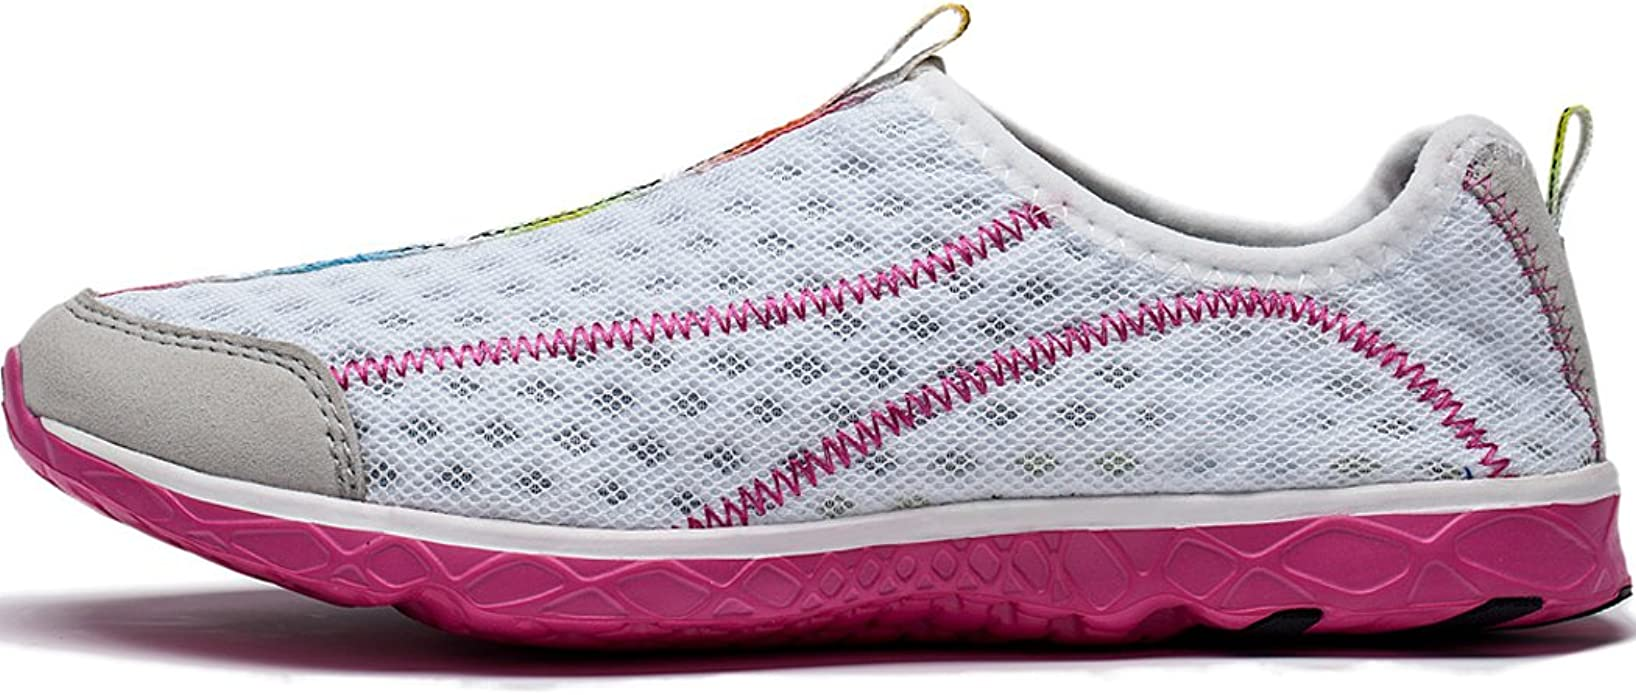 FENGDA Men/&Womens Breathable Mesh Casual Outdoor Beach Water Shoes Walking Sneakers